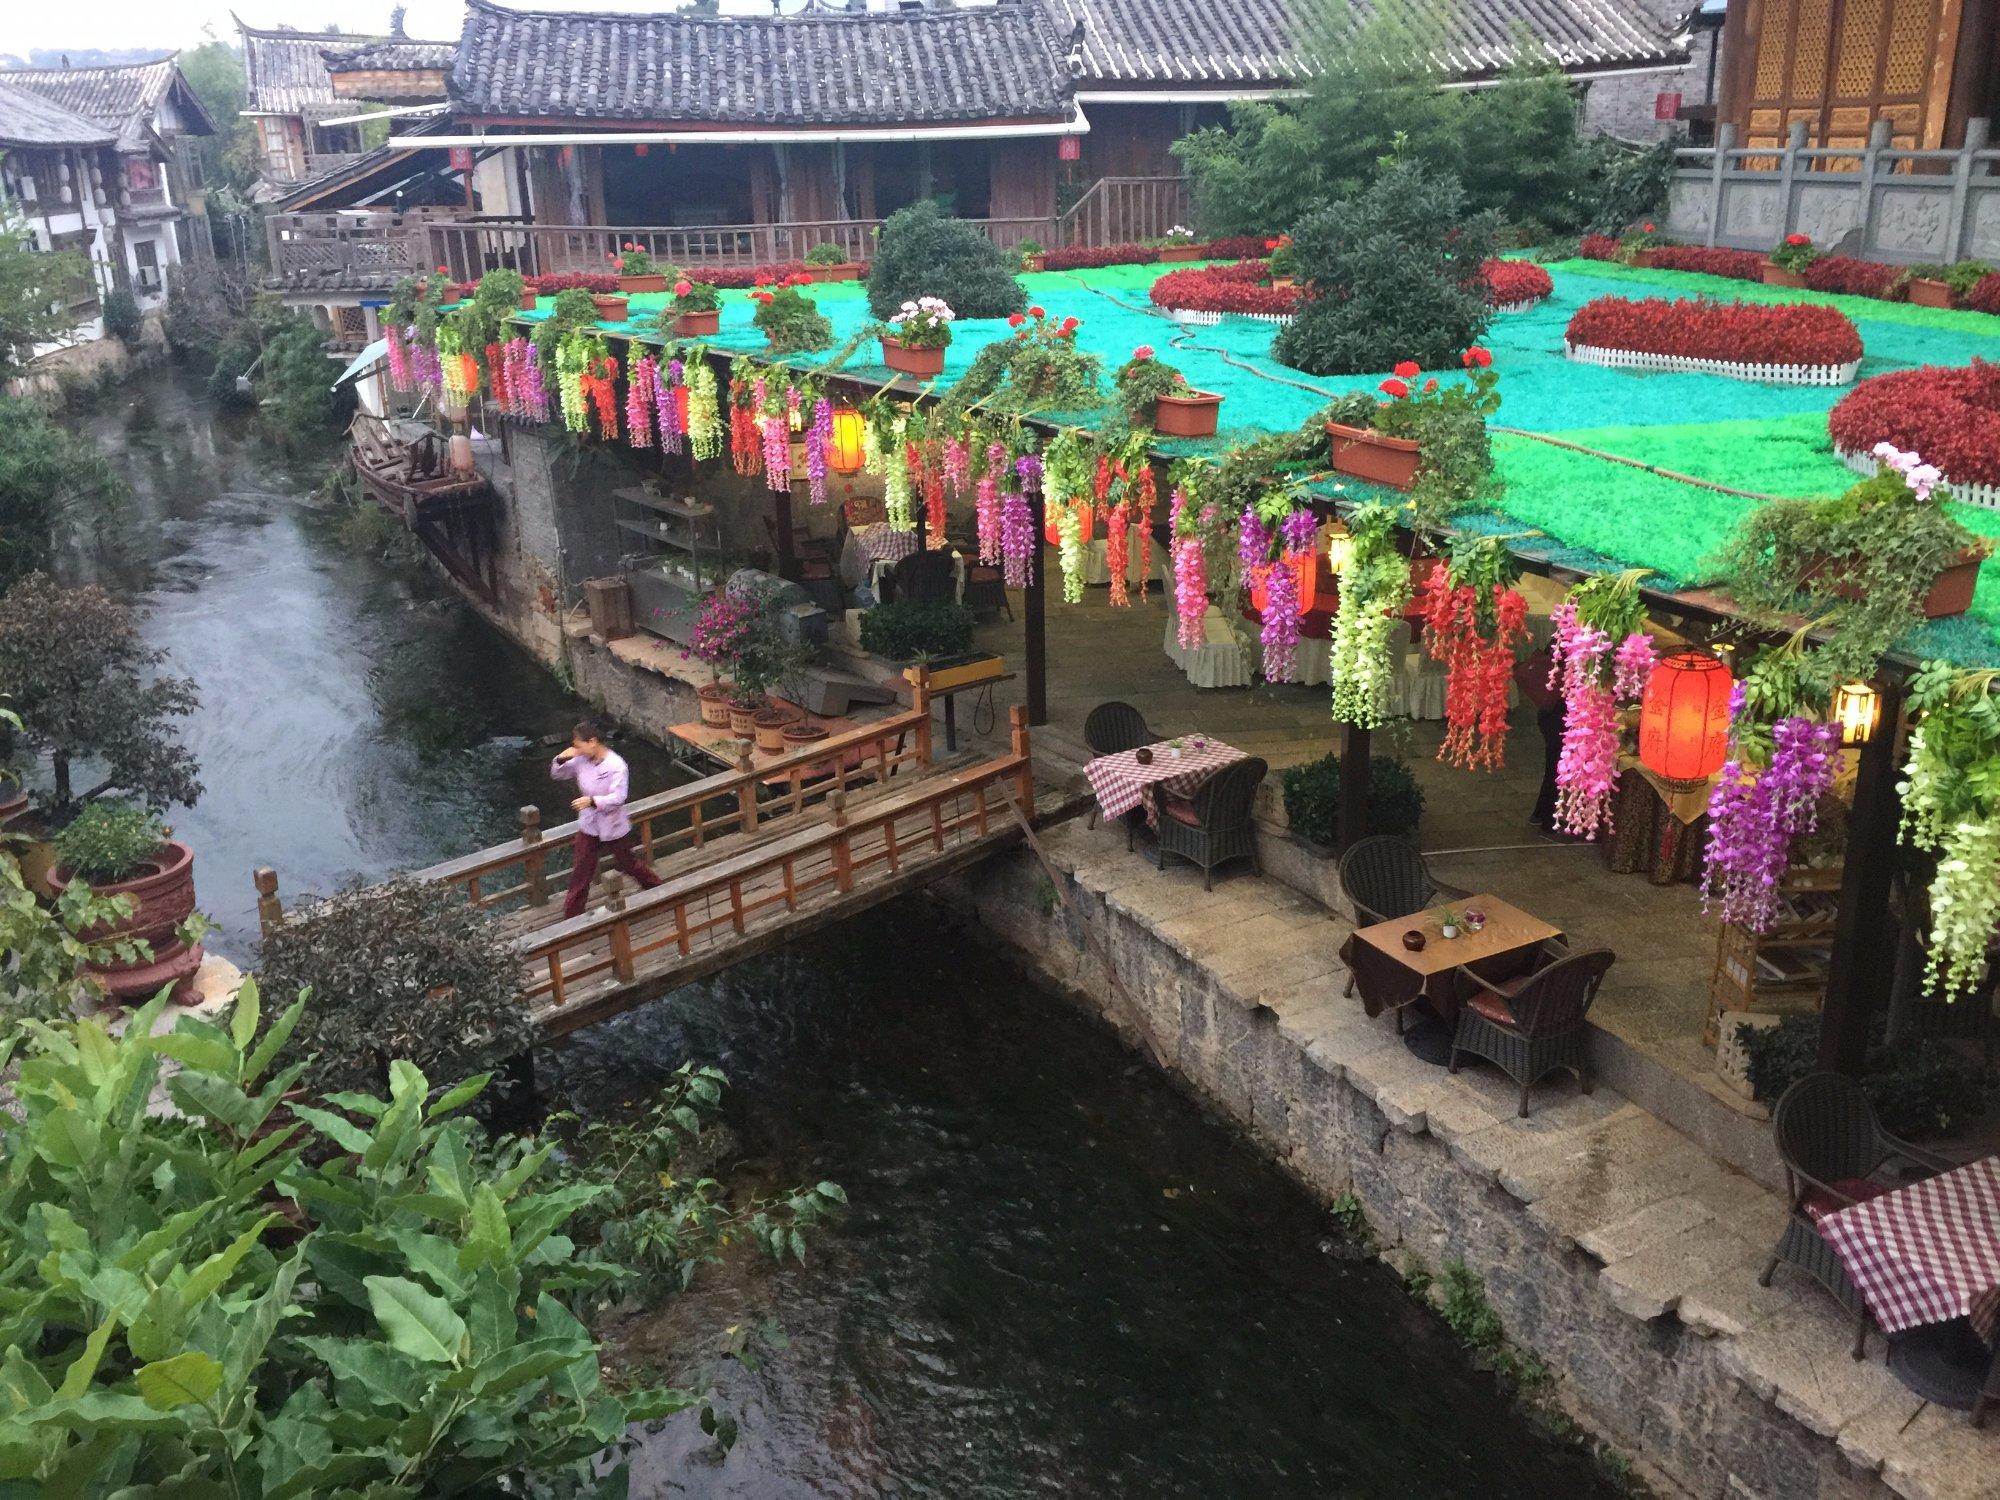 金府大飯店 (麗江市) - Lijiang Golden Path Hospitality Hotel - 3 …_插圖